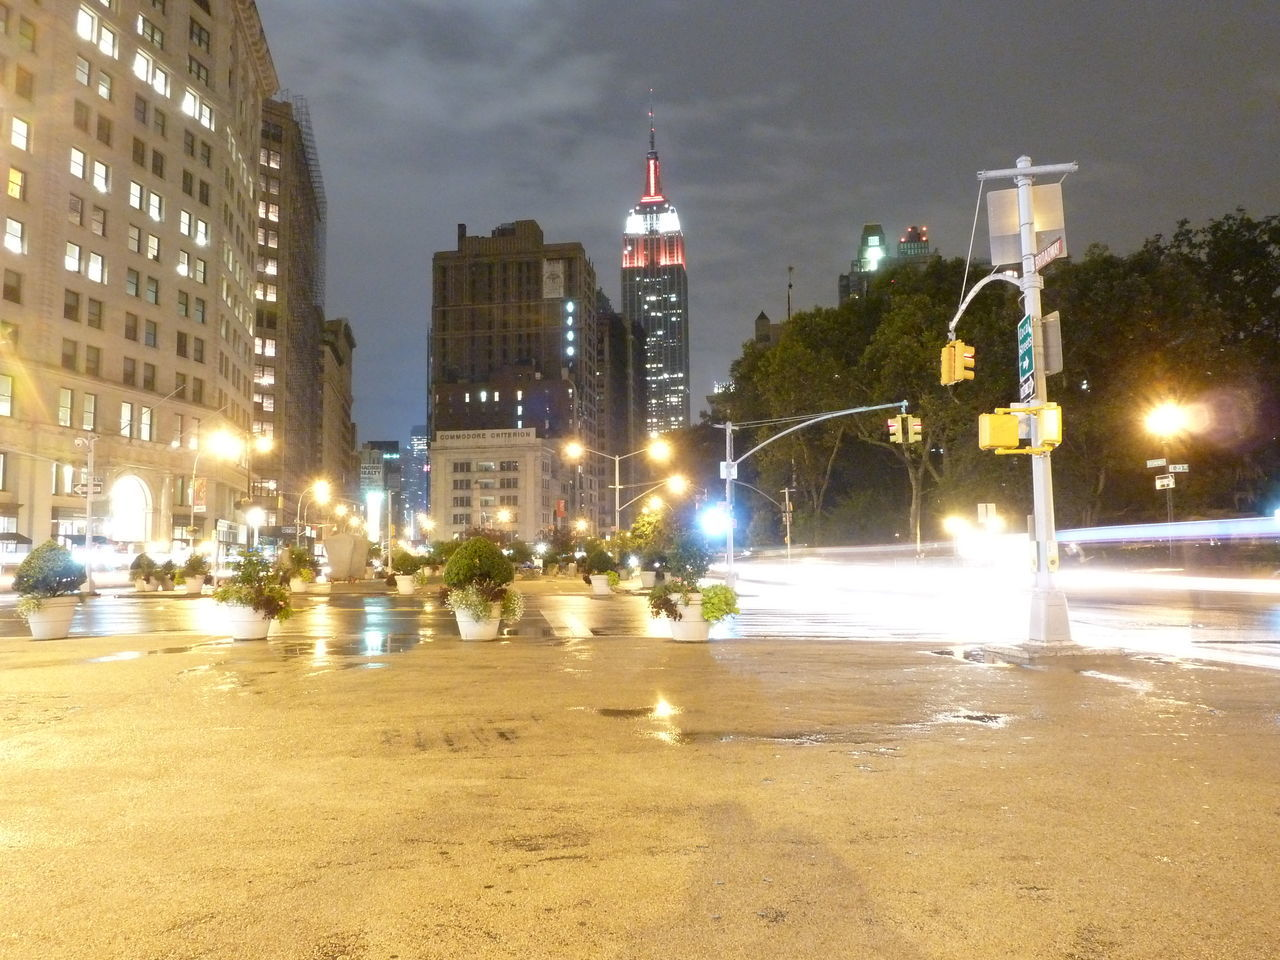 illuminated, architecture, night, building exterior, built structure, city, street, street light, transportation, sky, outdoors, land vehicle, no people, tree